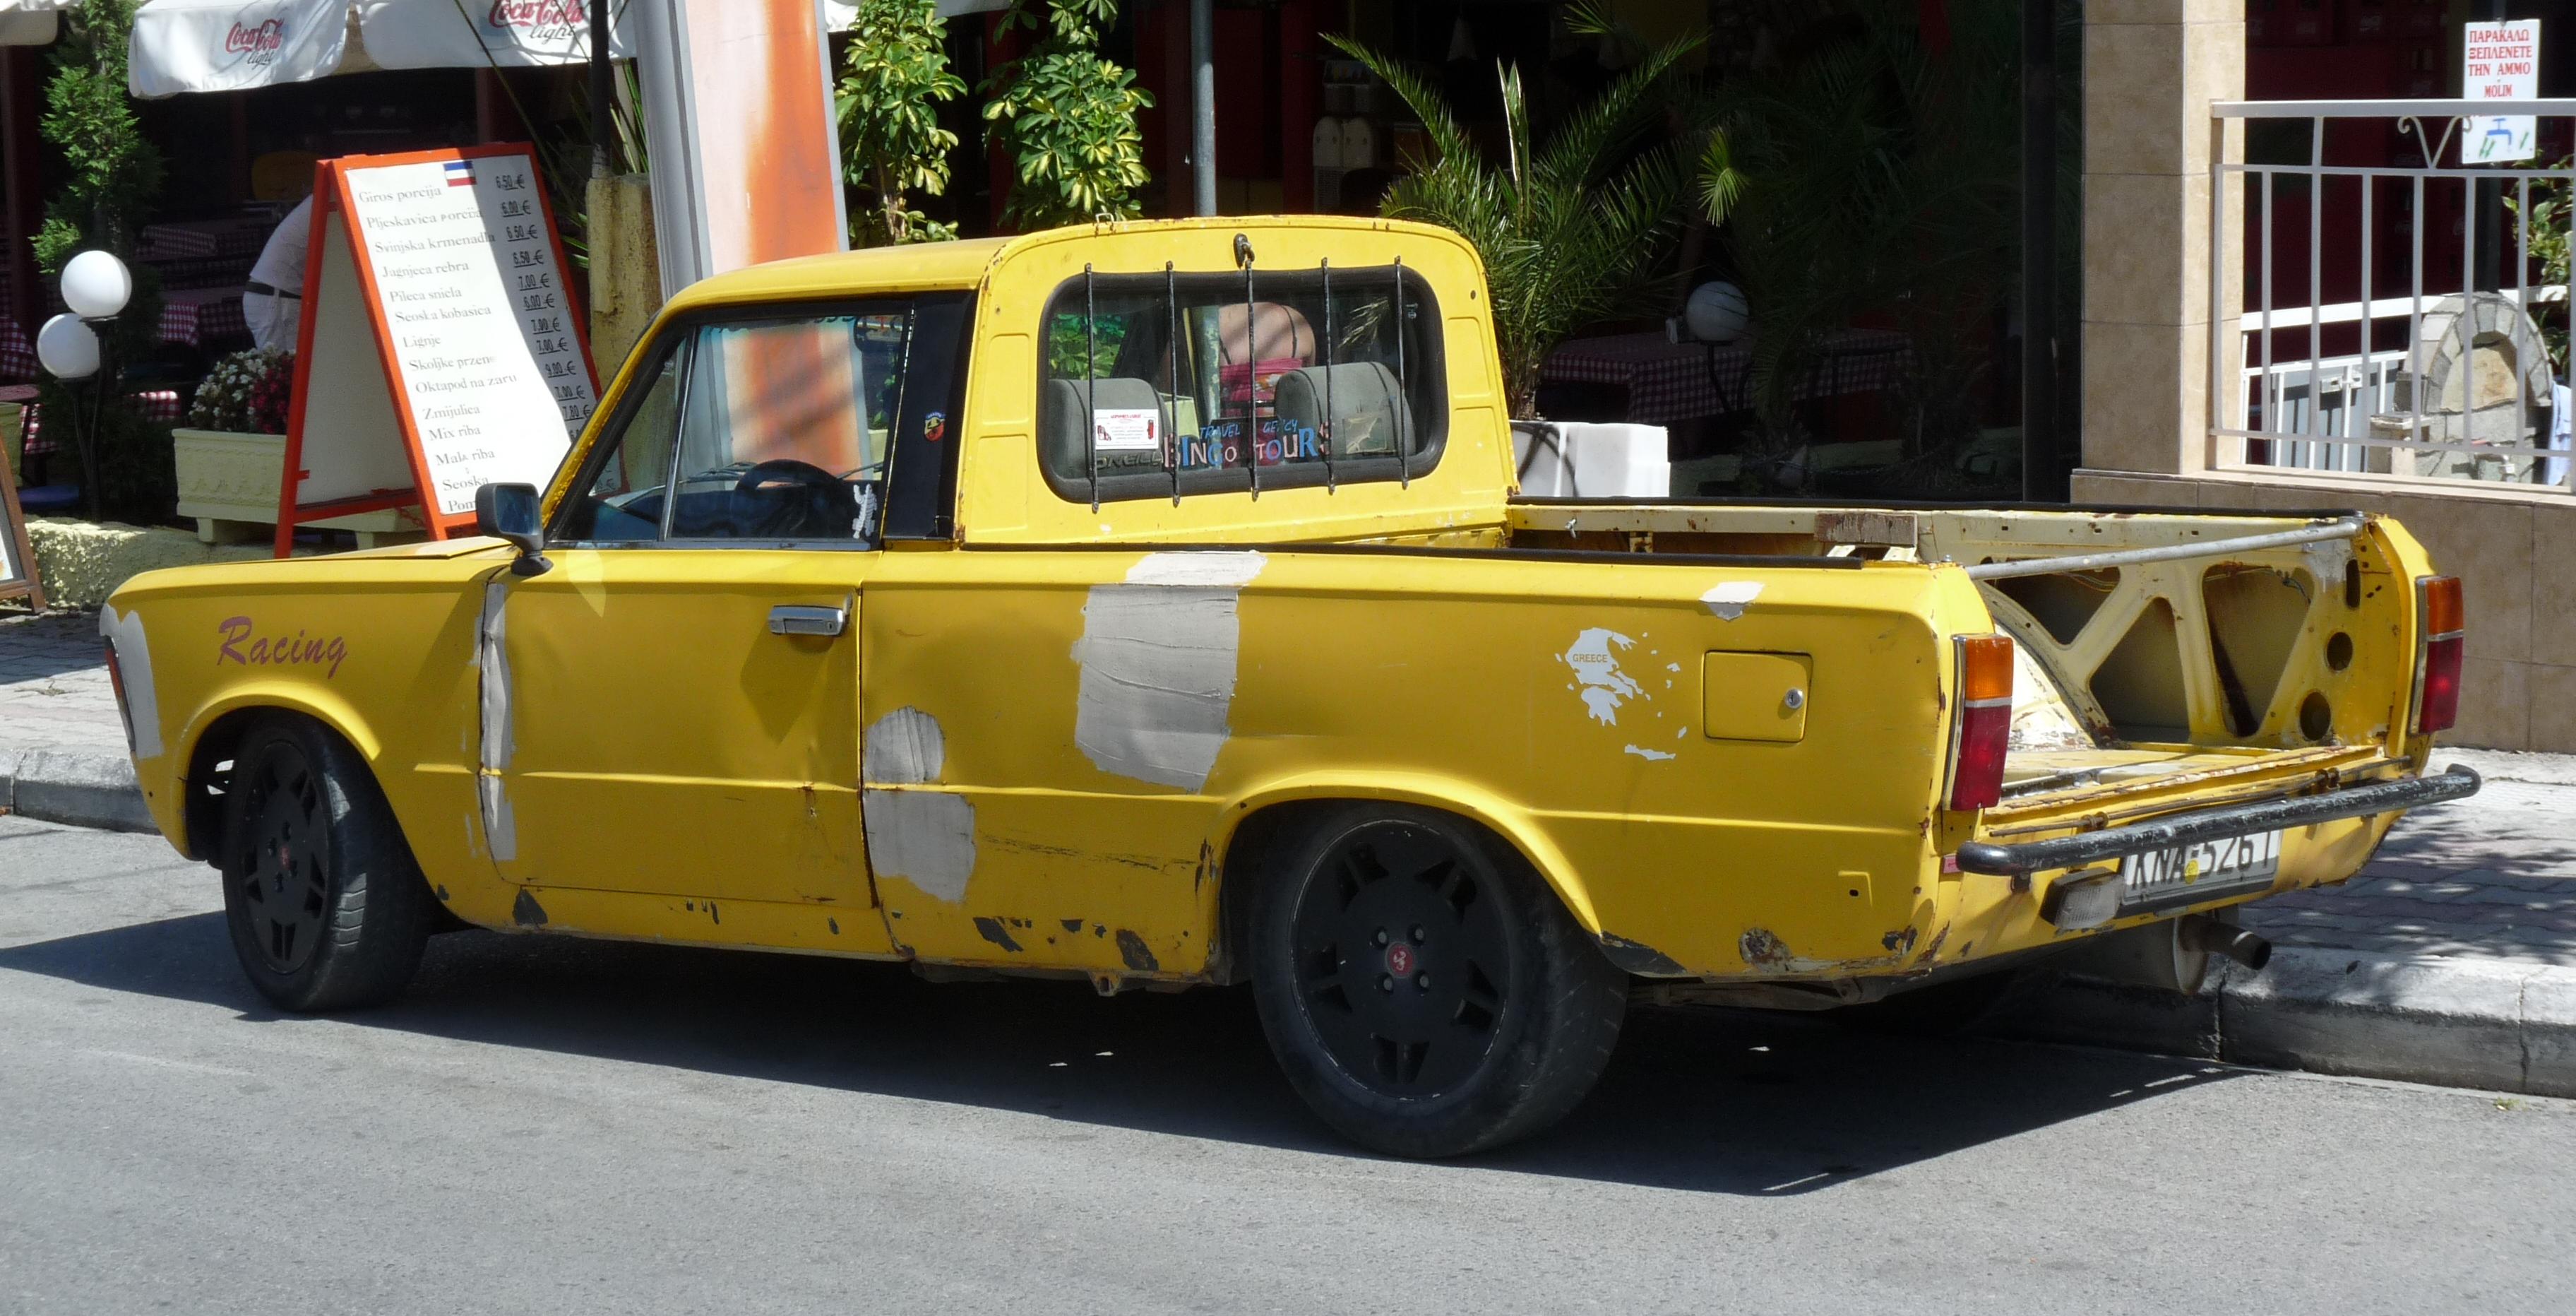 Inne rodzaje File:125p pickup Greece 2.JPG - Wikimedia Commons GN99